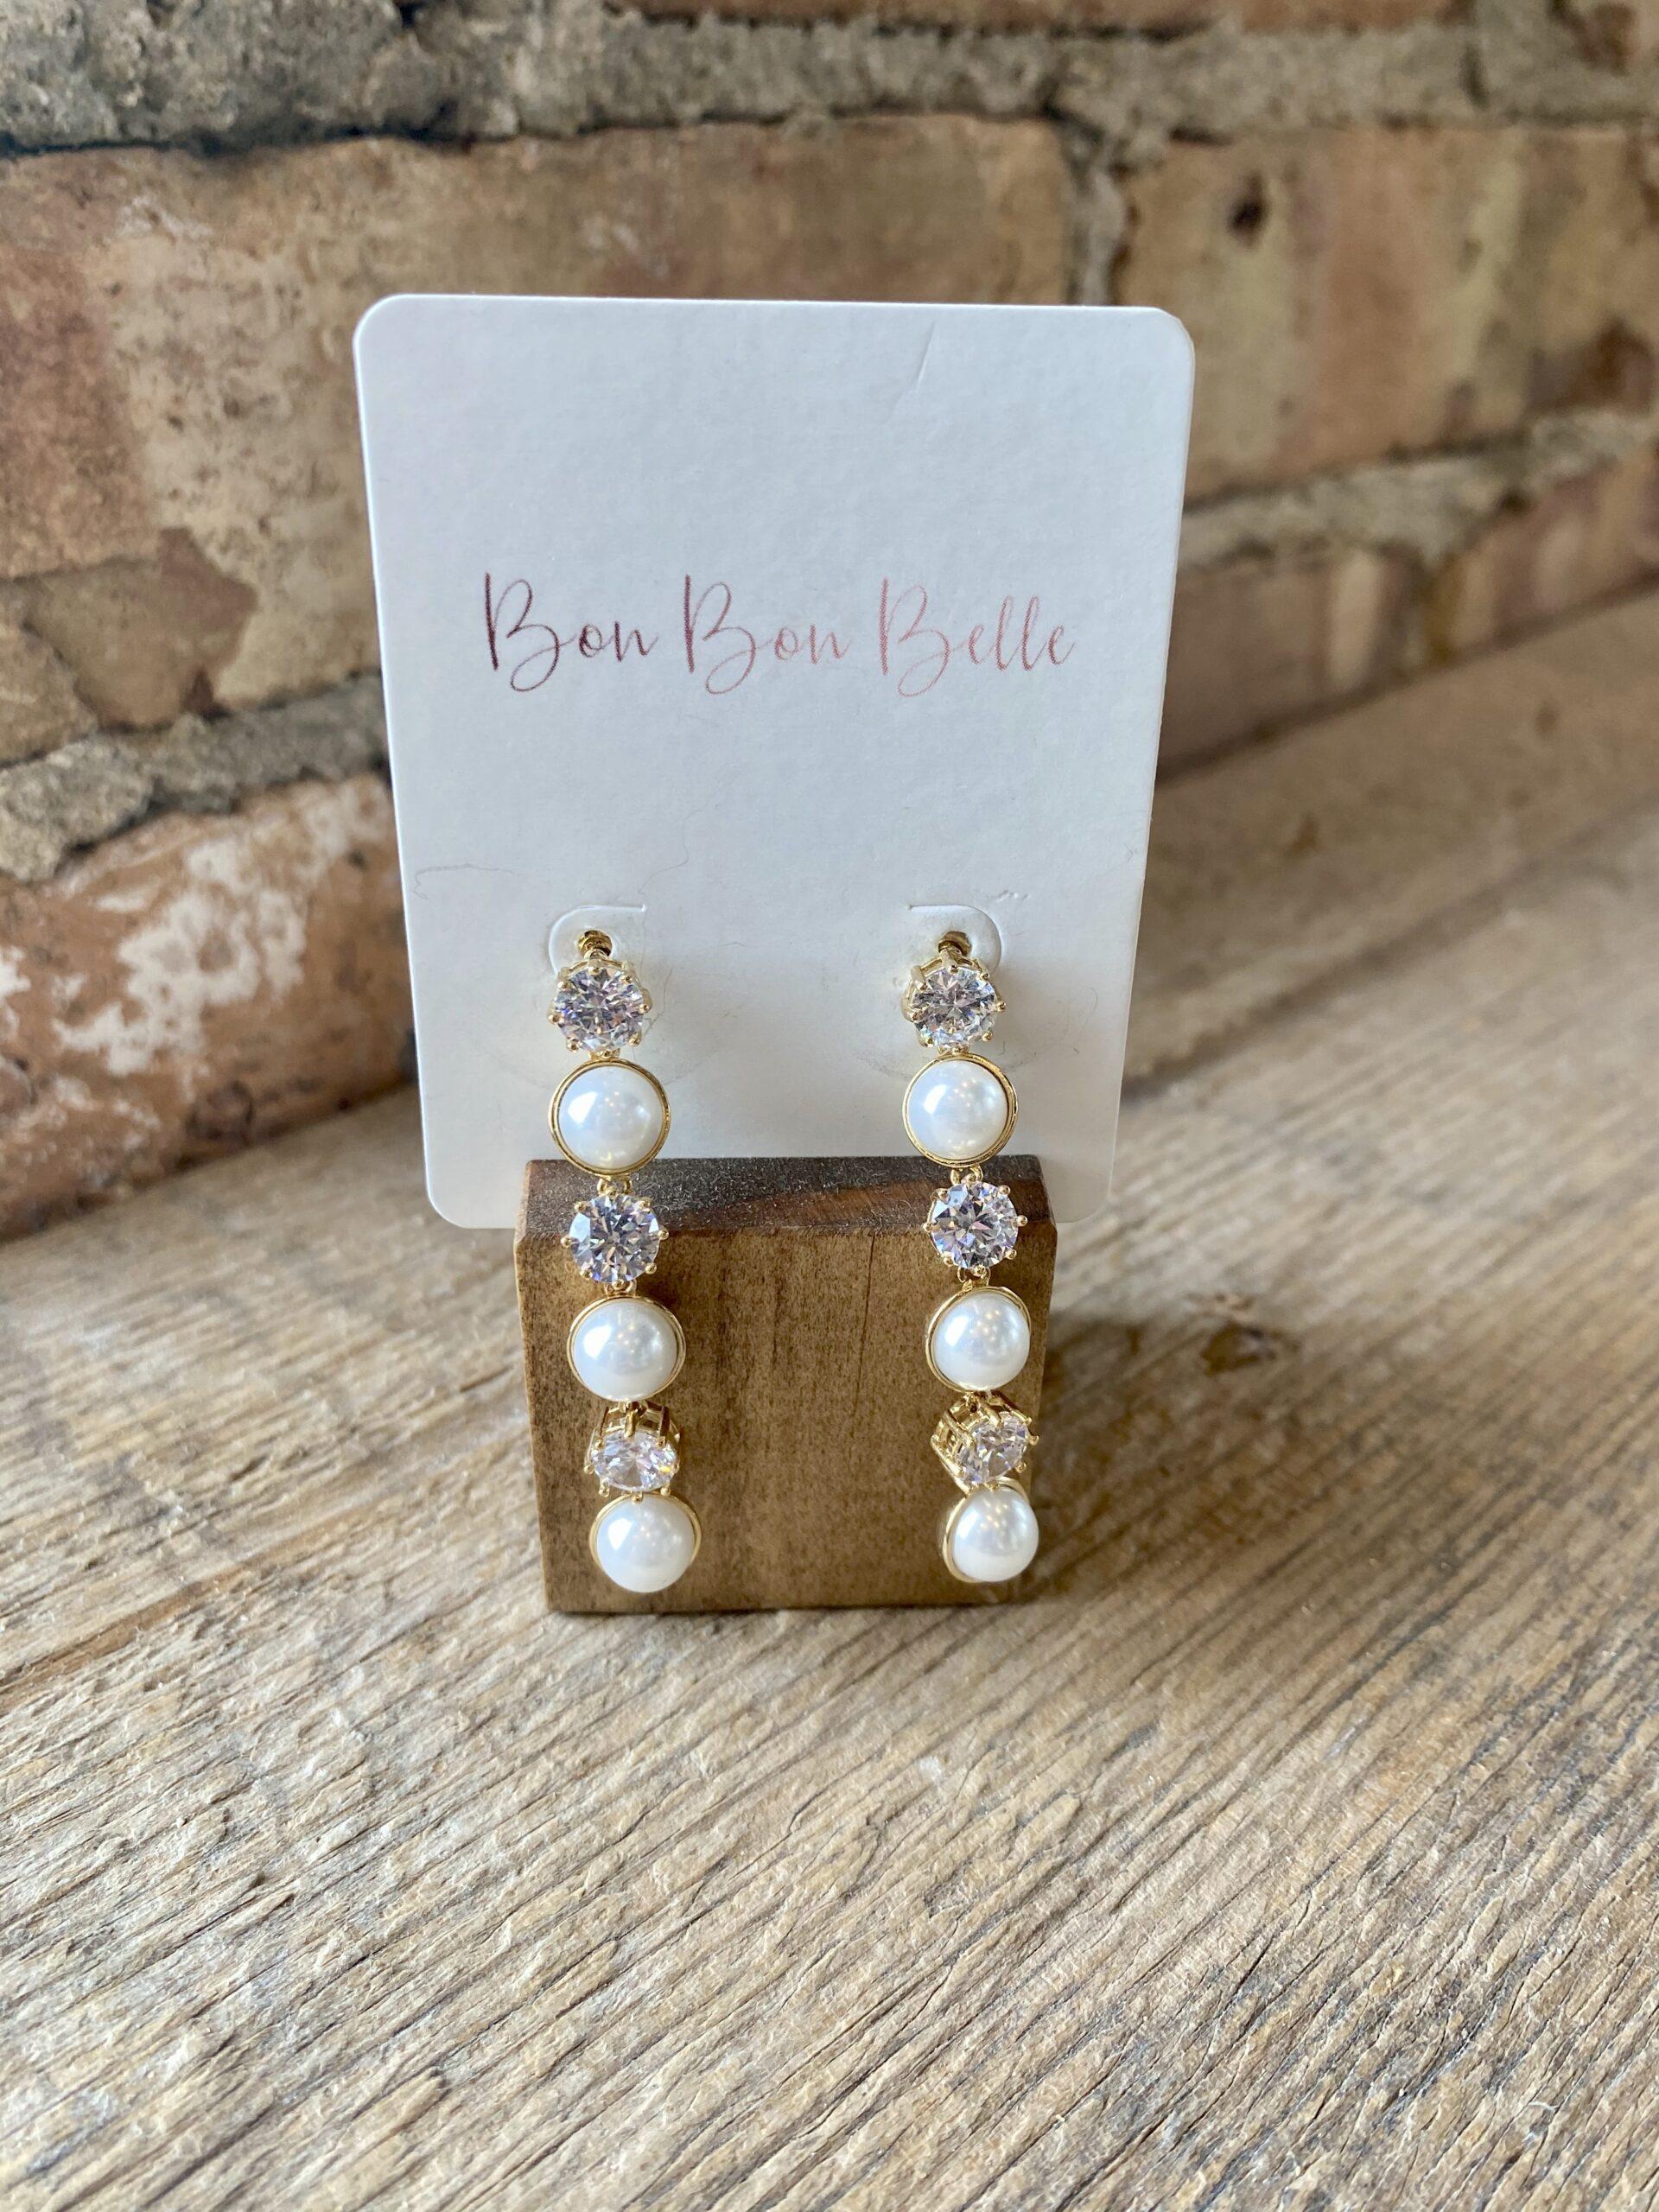 Bon Bon Belle Store | Bridal Accessories Earrings | Burlington, WI